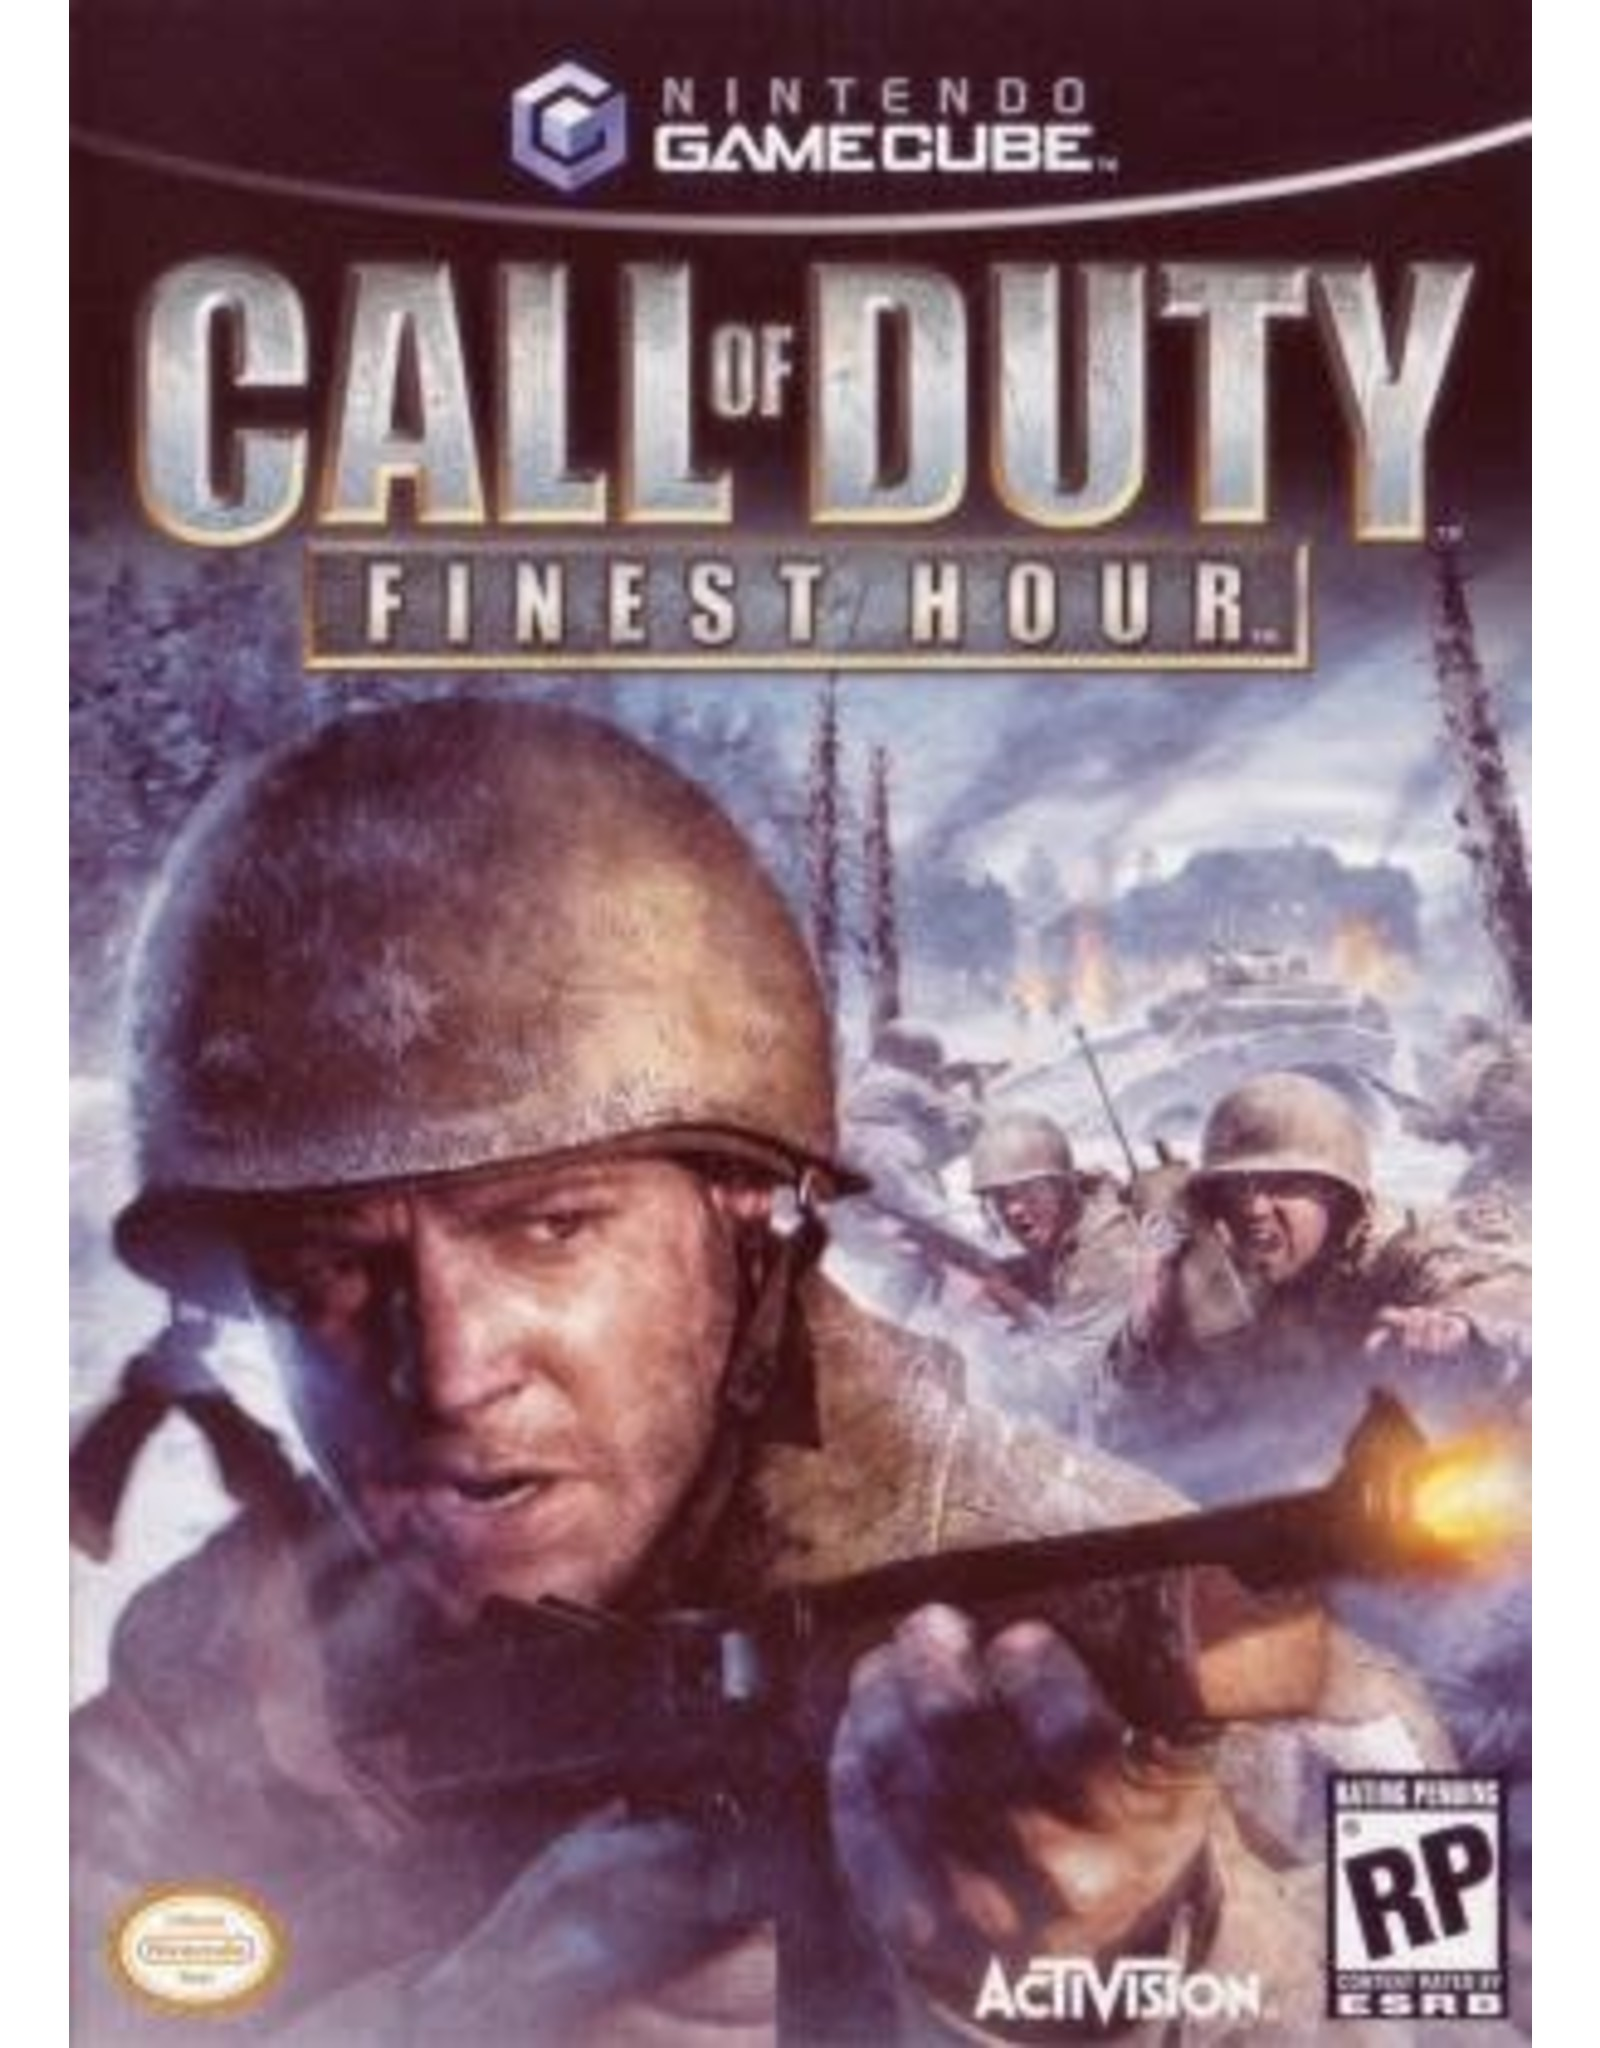 Gamecube Call of Duty Finest Hour (CIB)